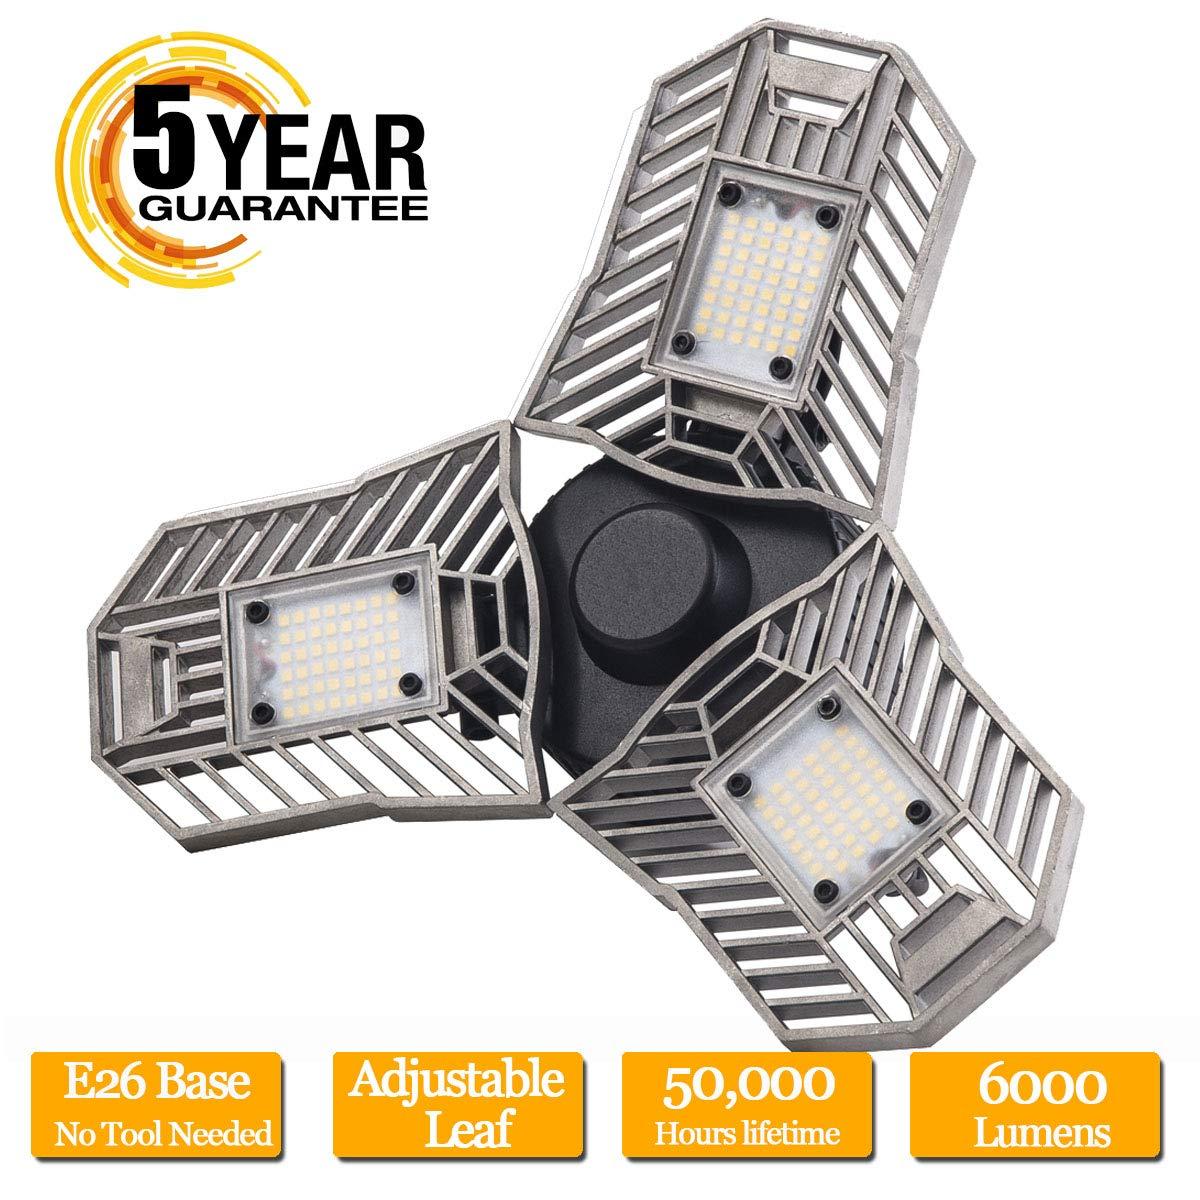 LED Garage Lights, 60W E26/E27 6000LM Deformable Ceiling Lighting for Full Area, LED Light Bulbs for Workshop, barn, Warehouse etc. by Mopzlink